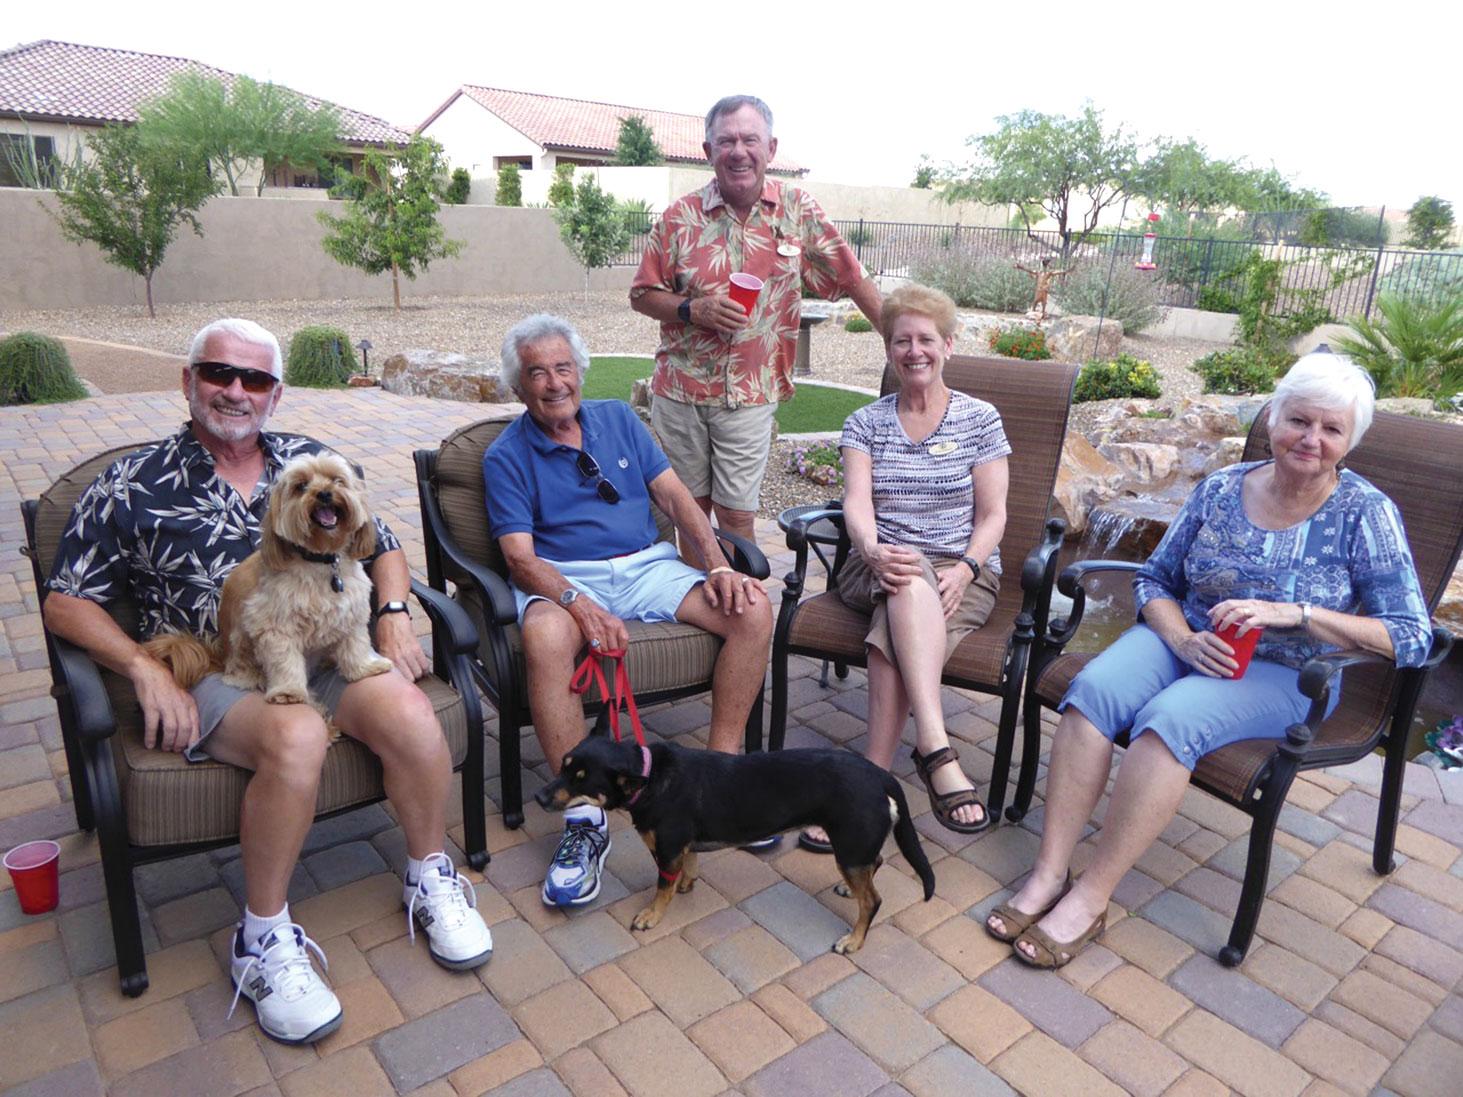 Yard hosts: Gene Lawrence on the left and Carol Lawrence on the right; nibbles and beverage hosts: Jim Karp, Jean Morgan and Mark Morgan, standing